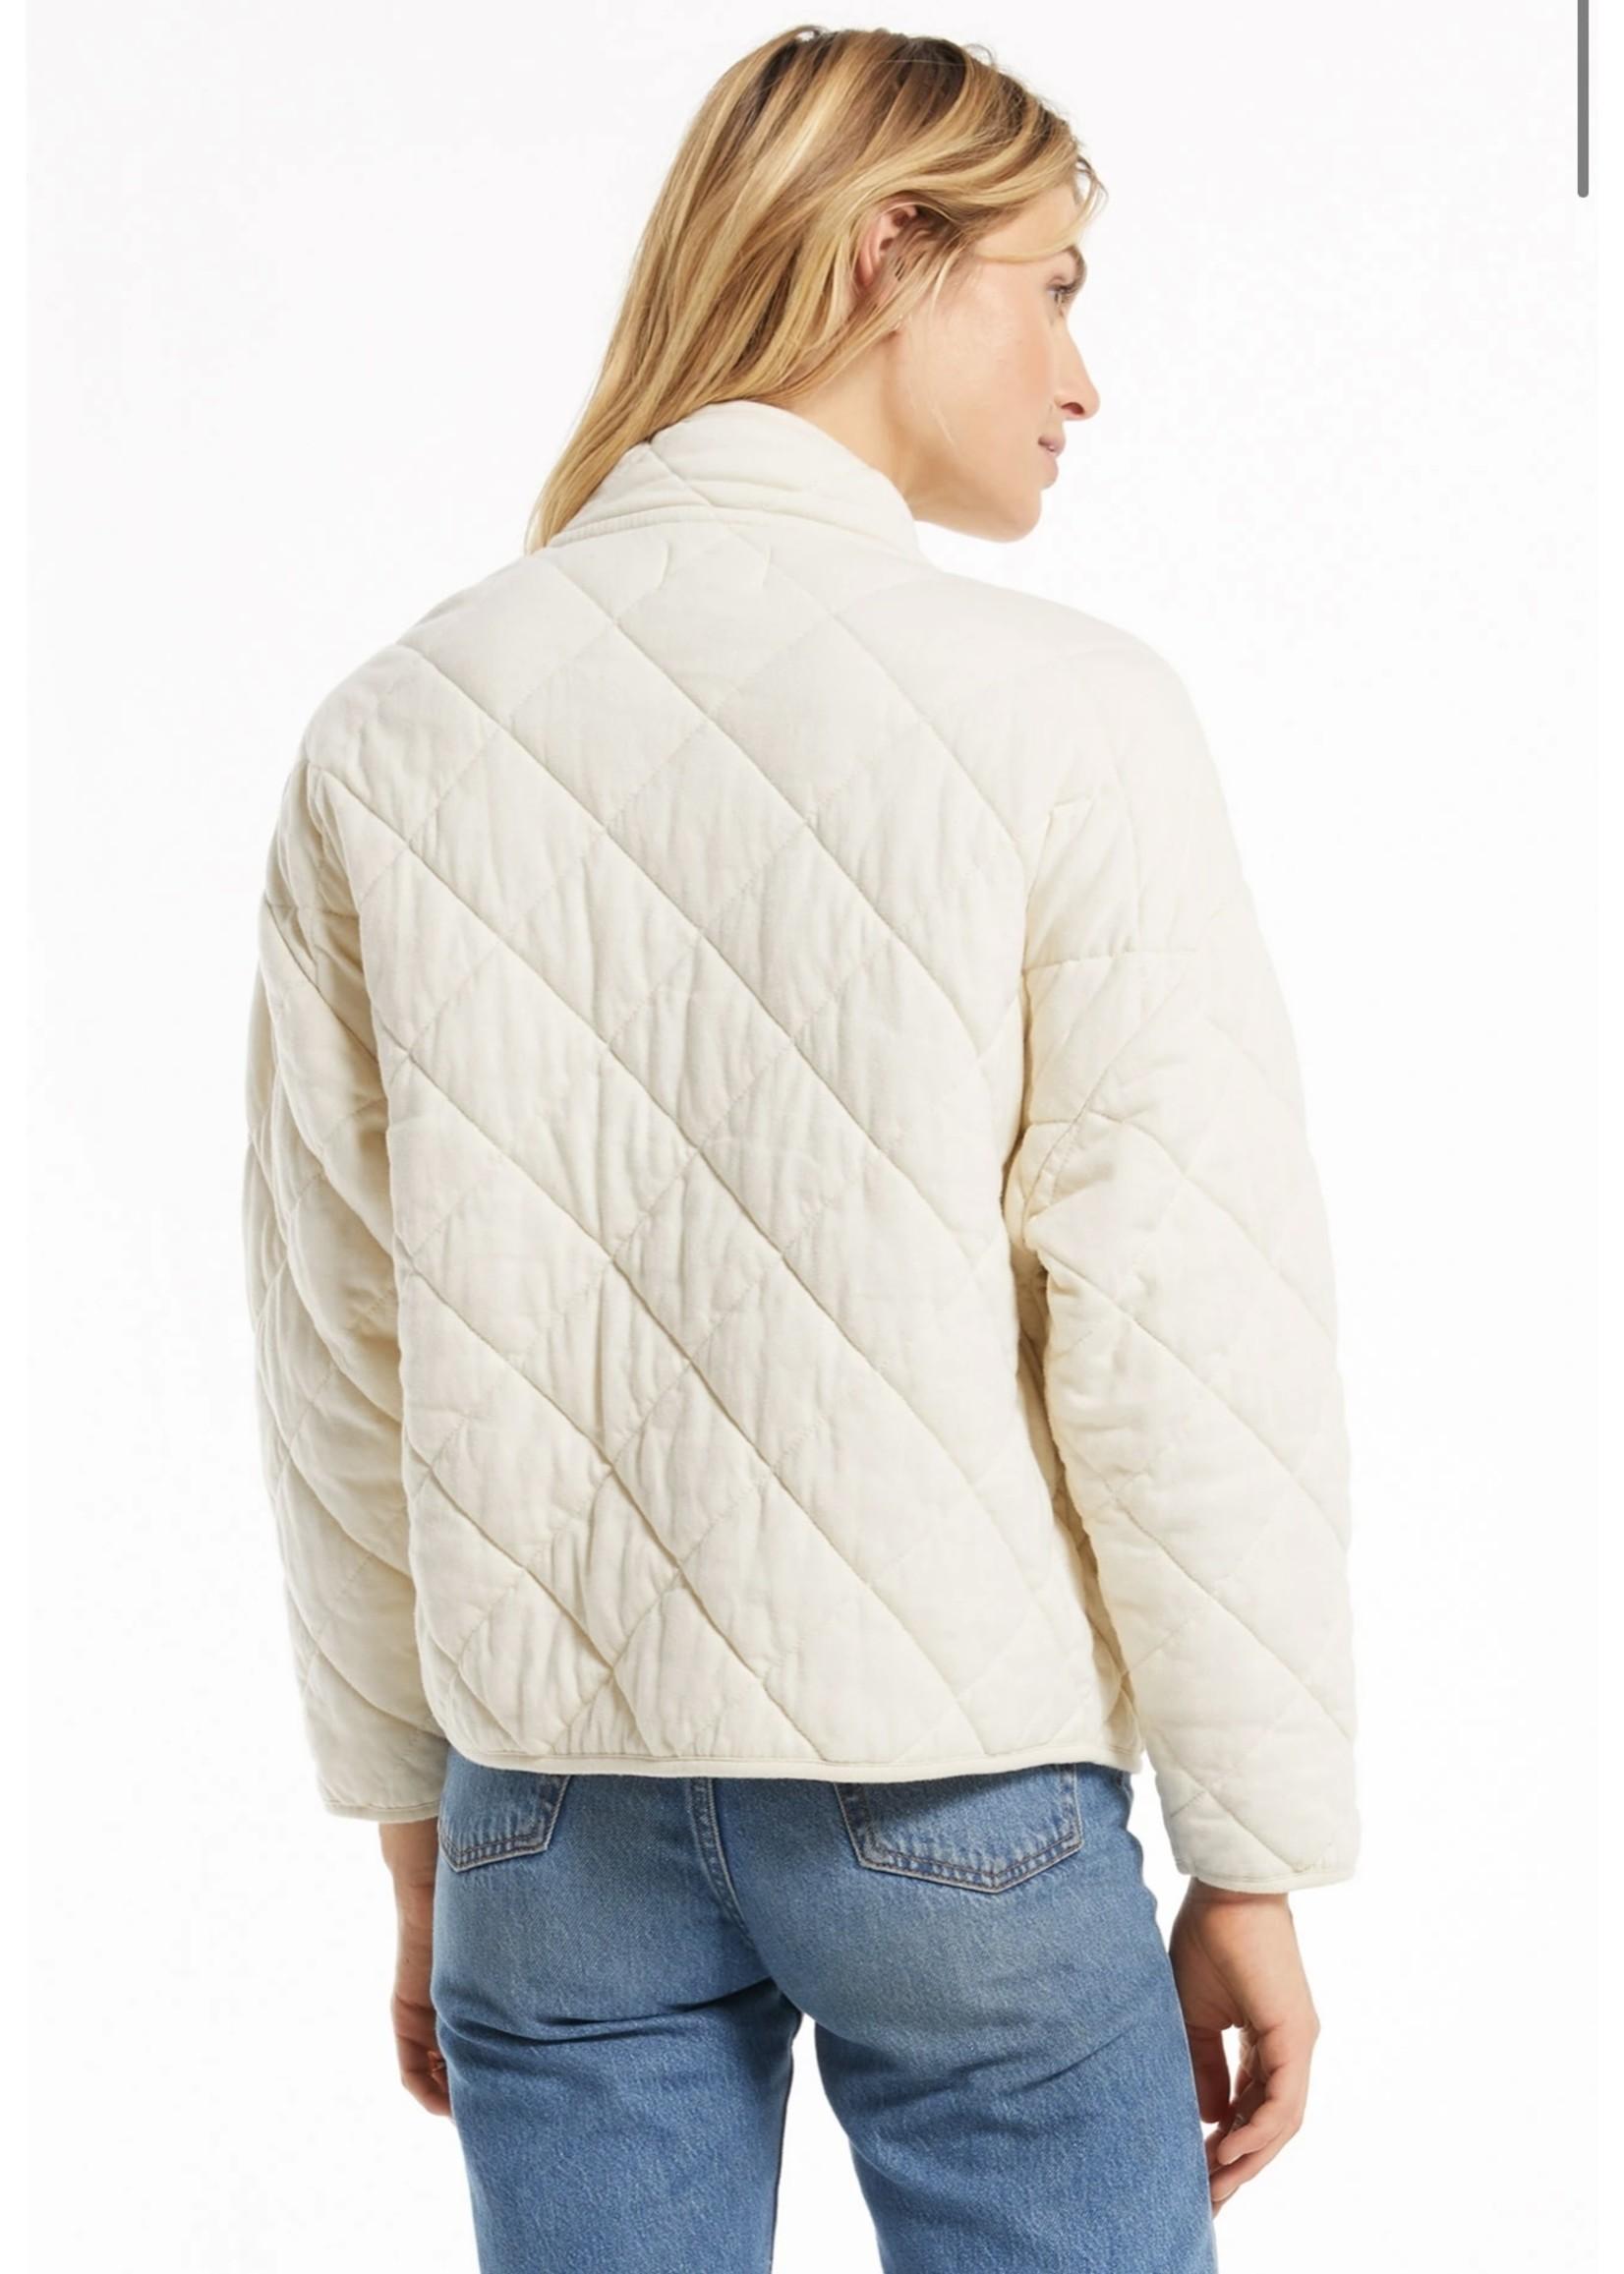 Z Supply Maya Quilted Jacket - ZJ203646